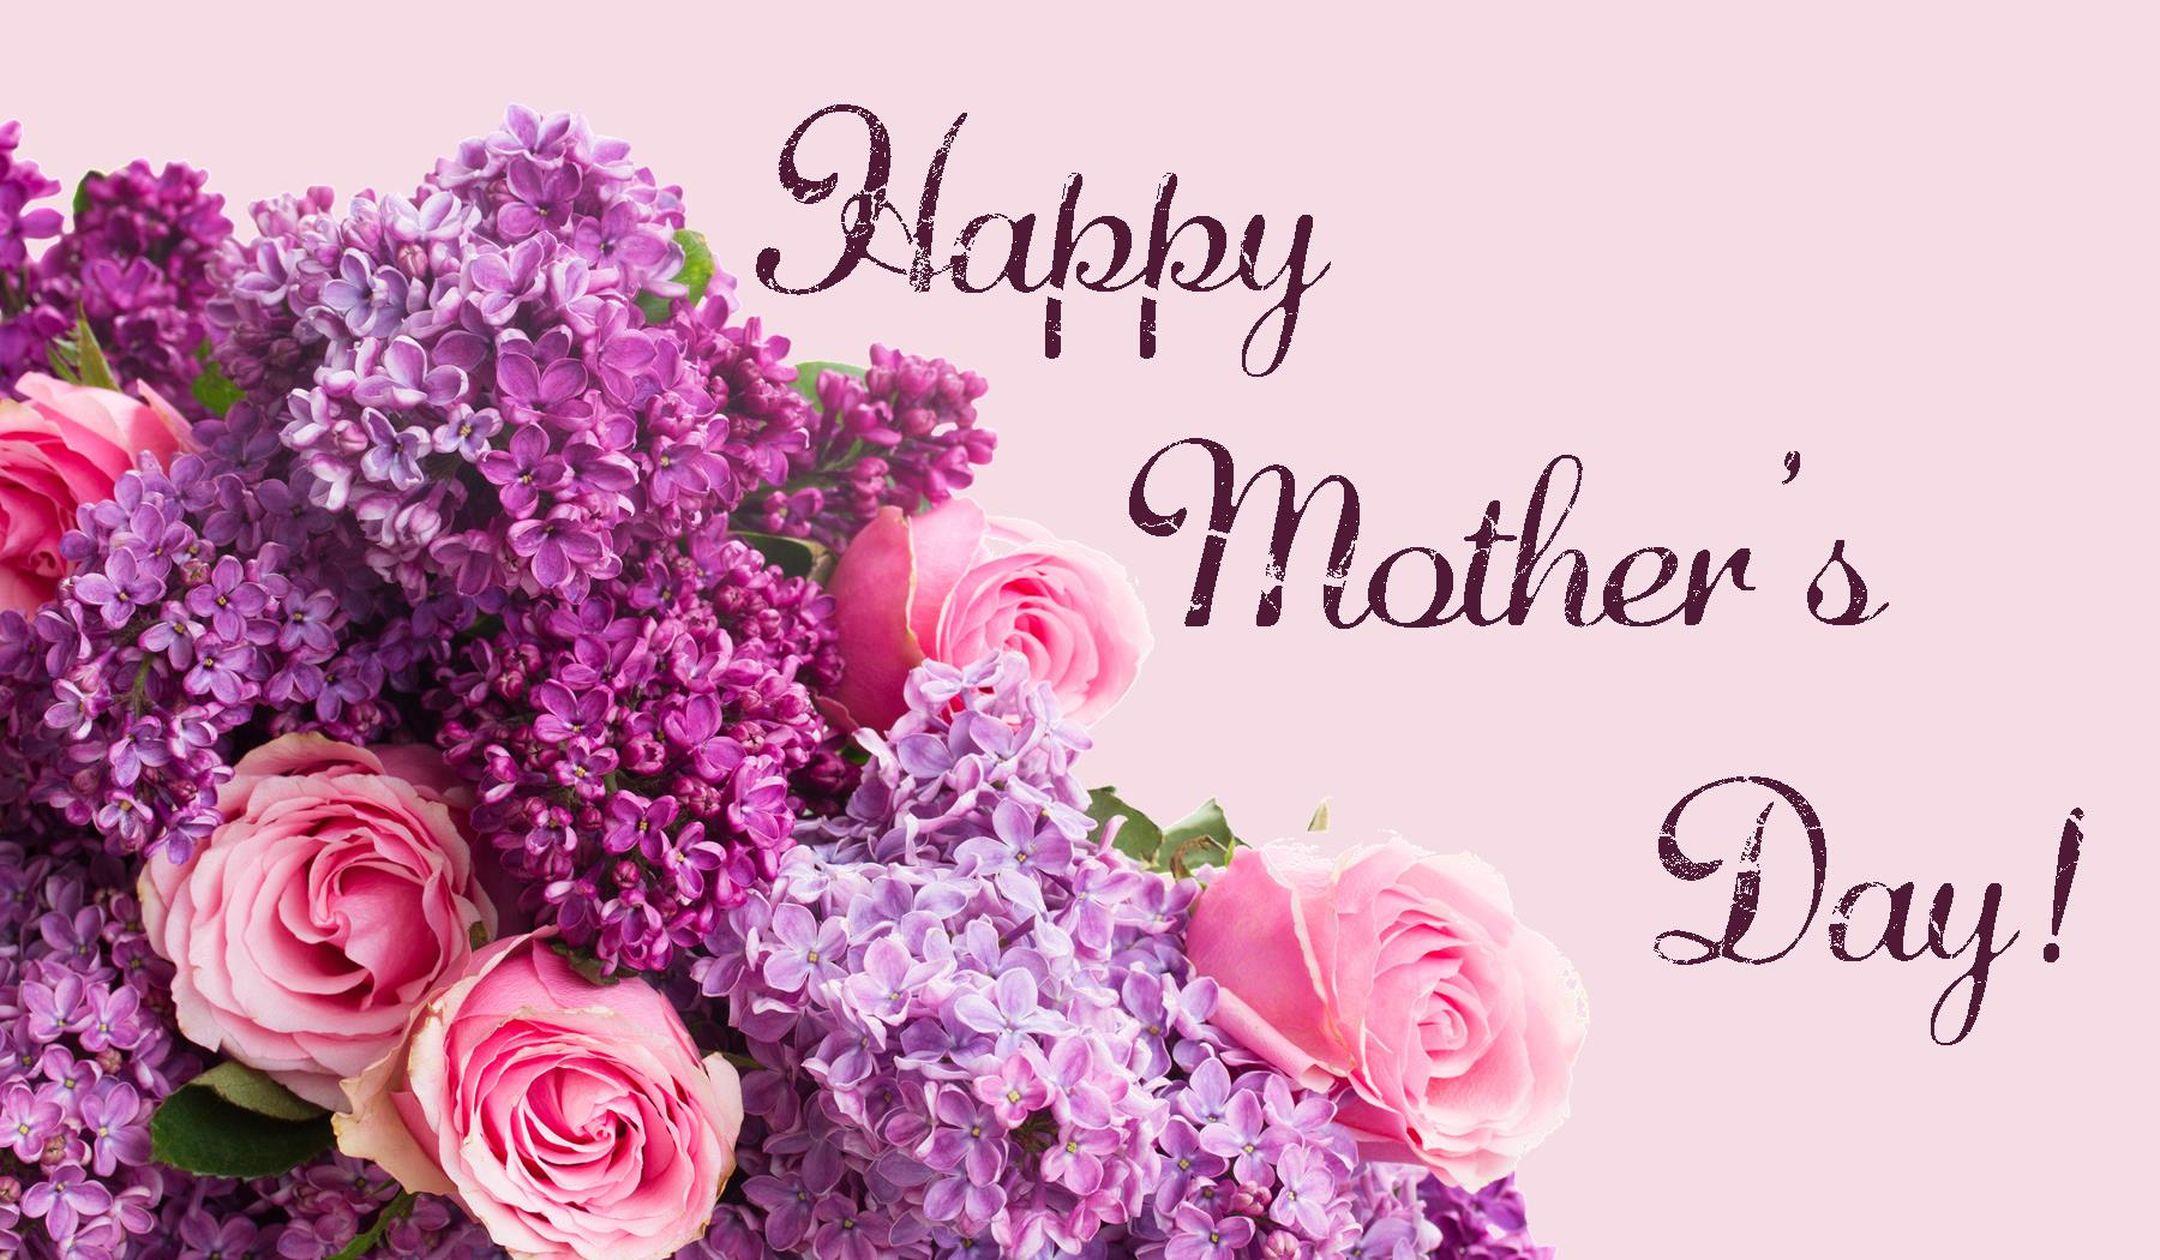 Download Original Image 2160 X 1260 Px Background Happy Mothers